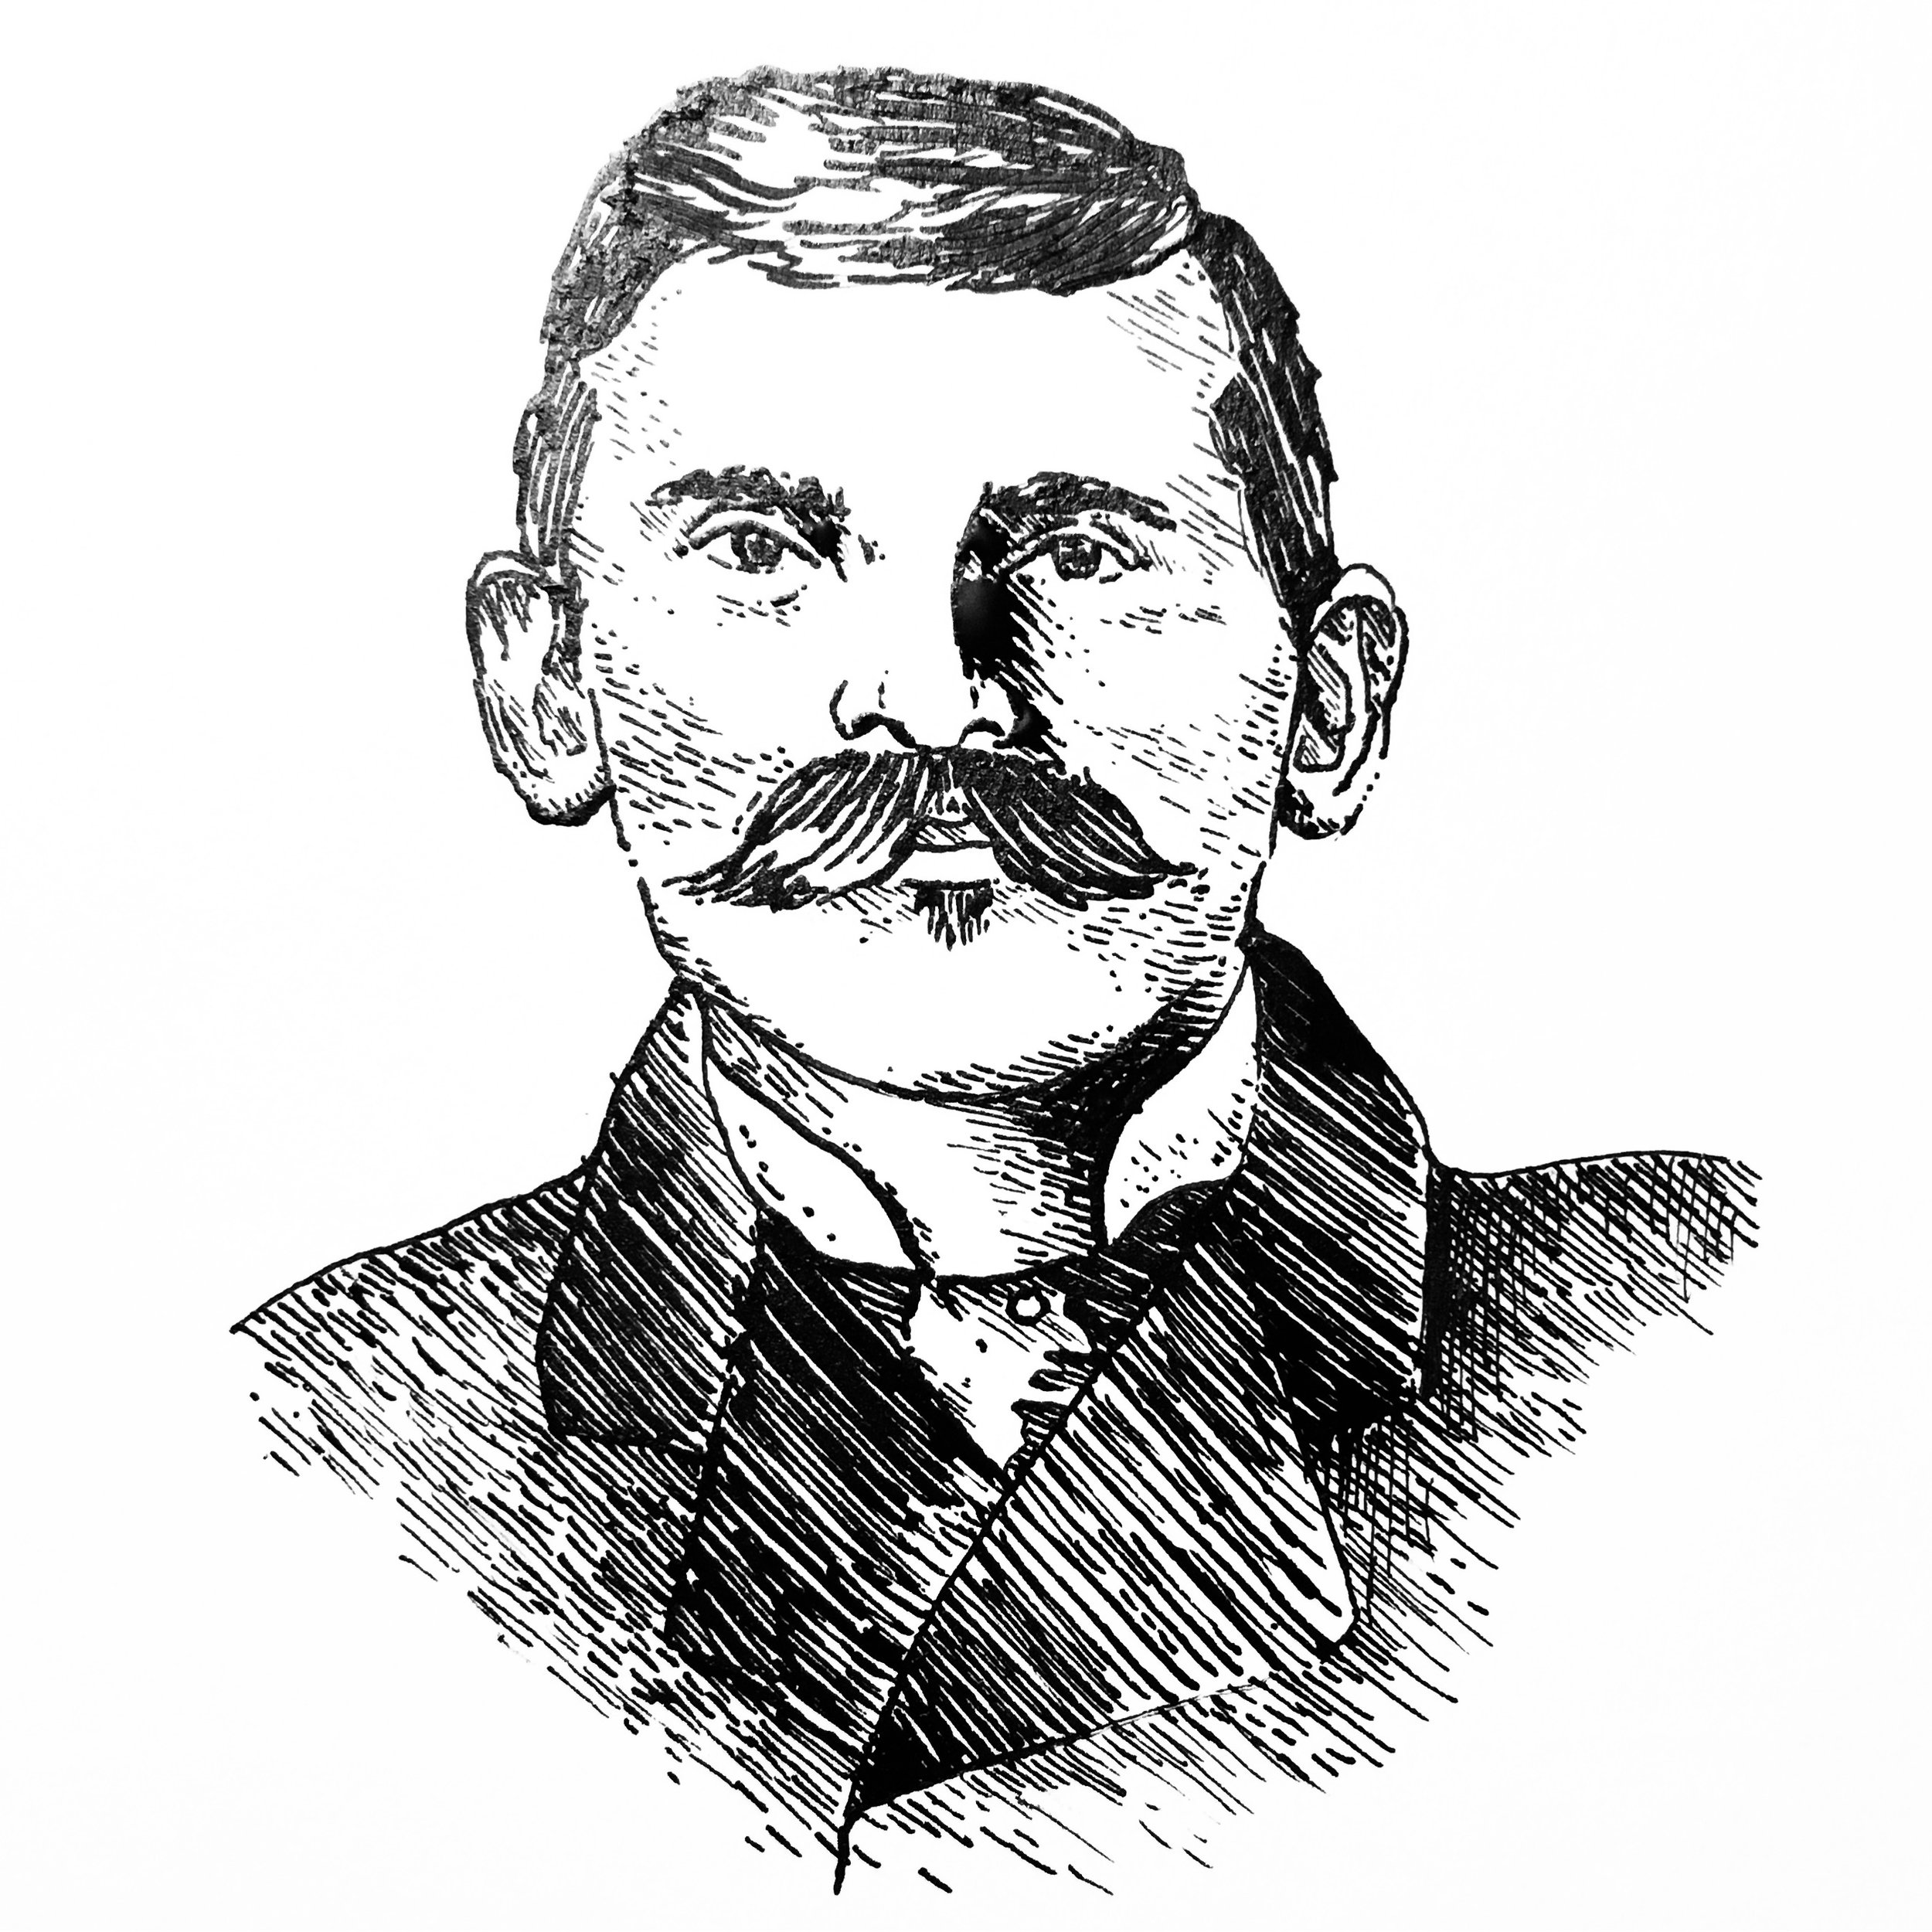 IMG_1897.JPG